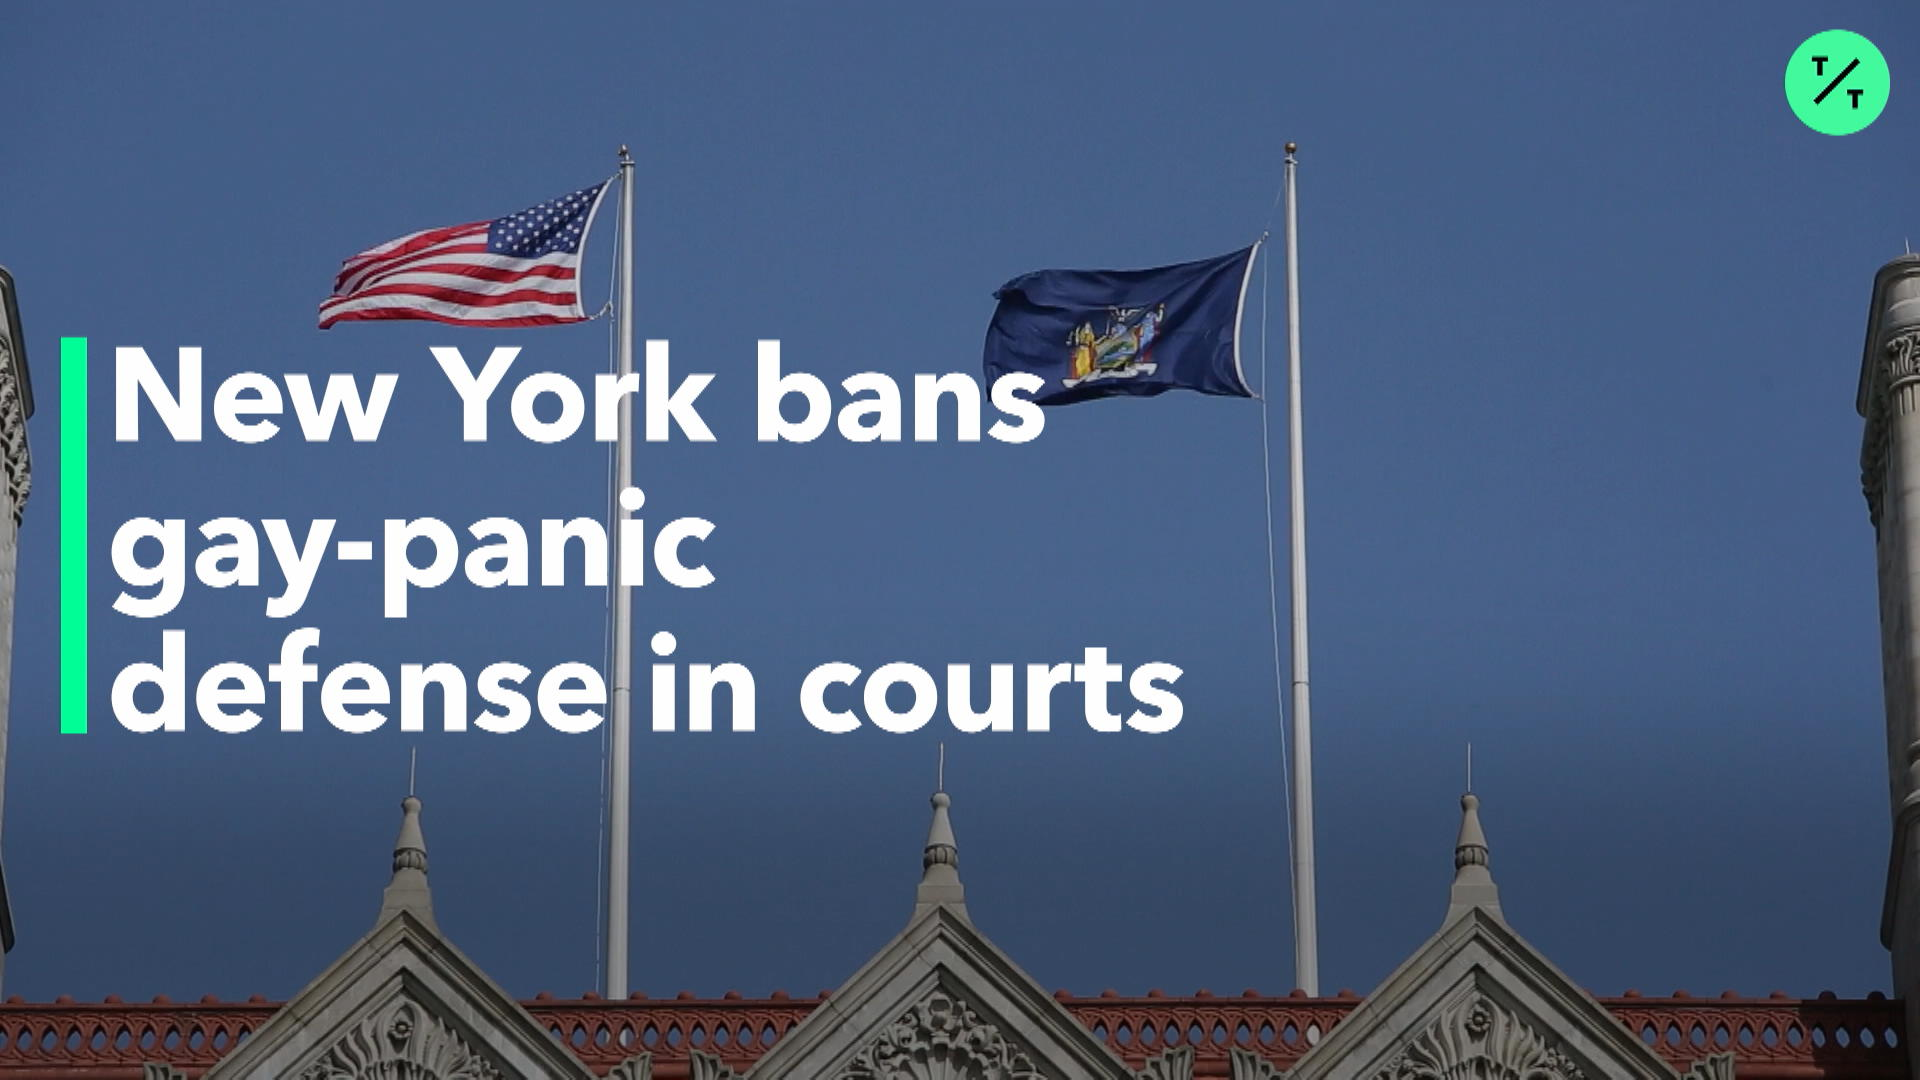 NY Bans Gay-Panic Defense In Courts